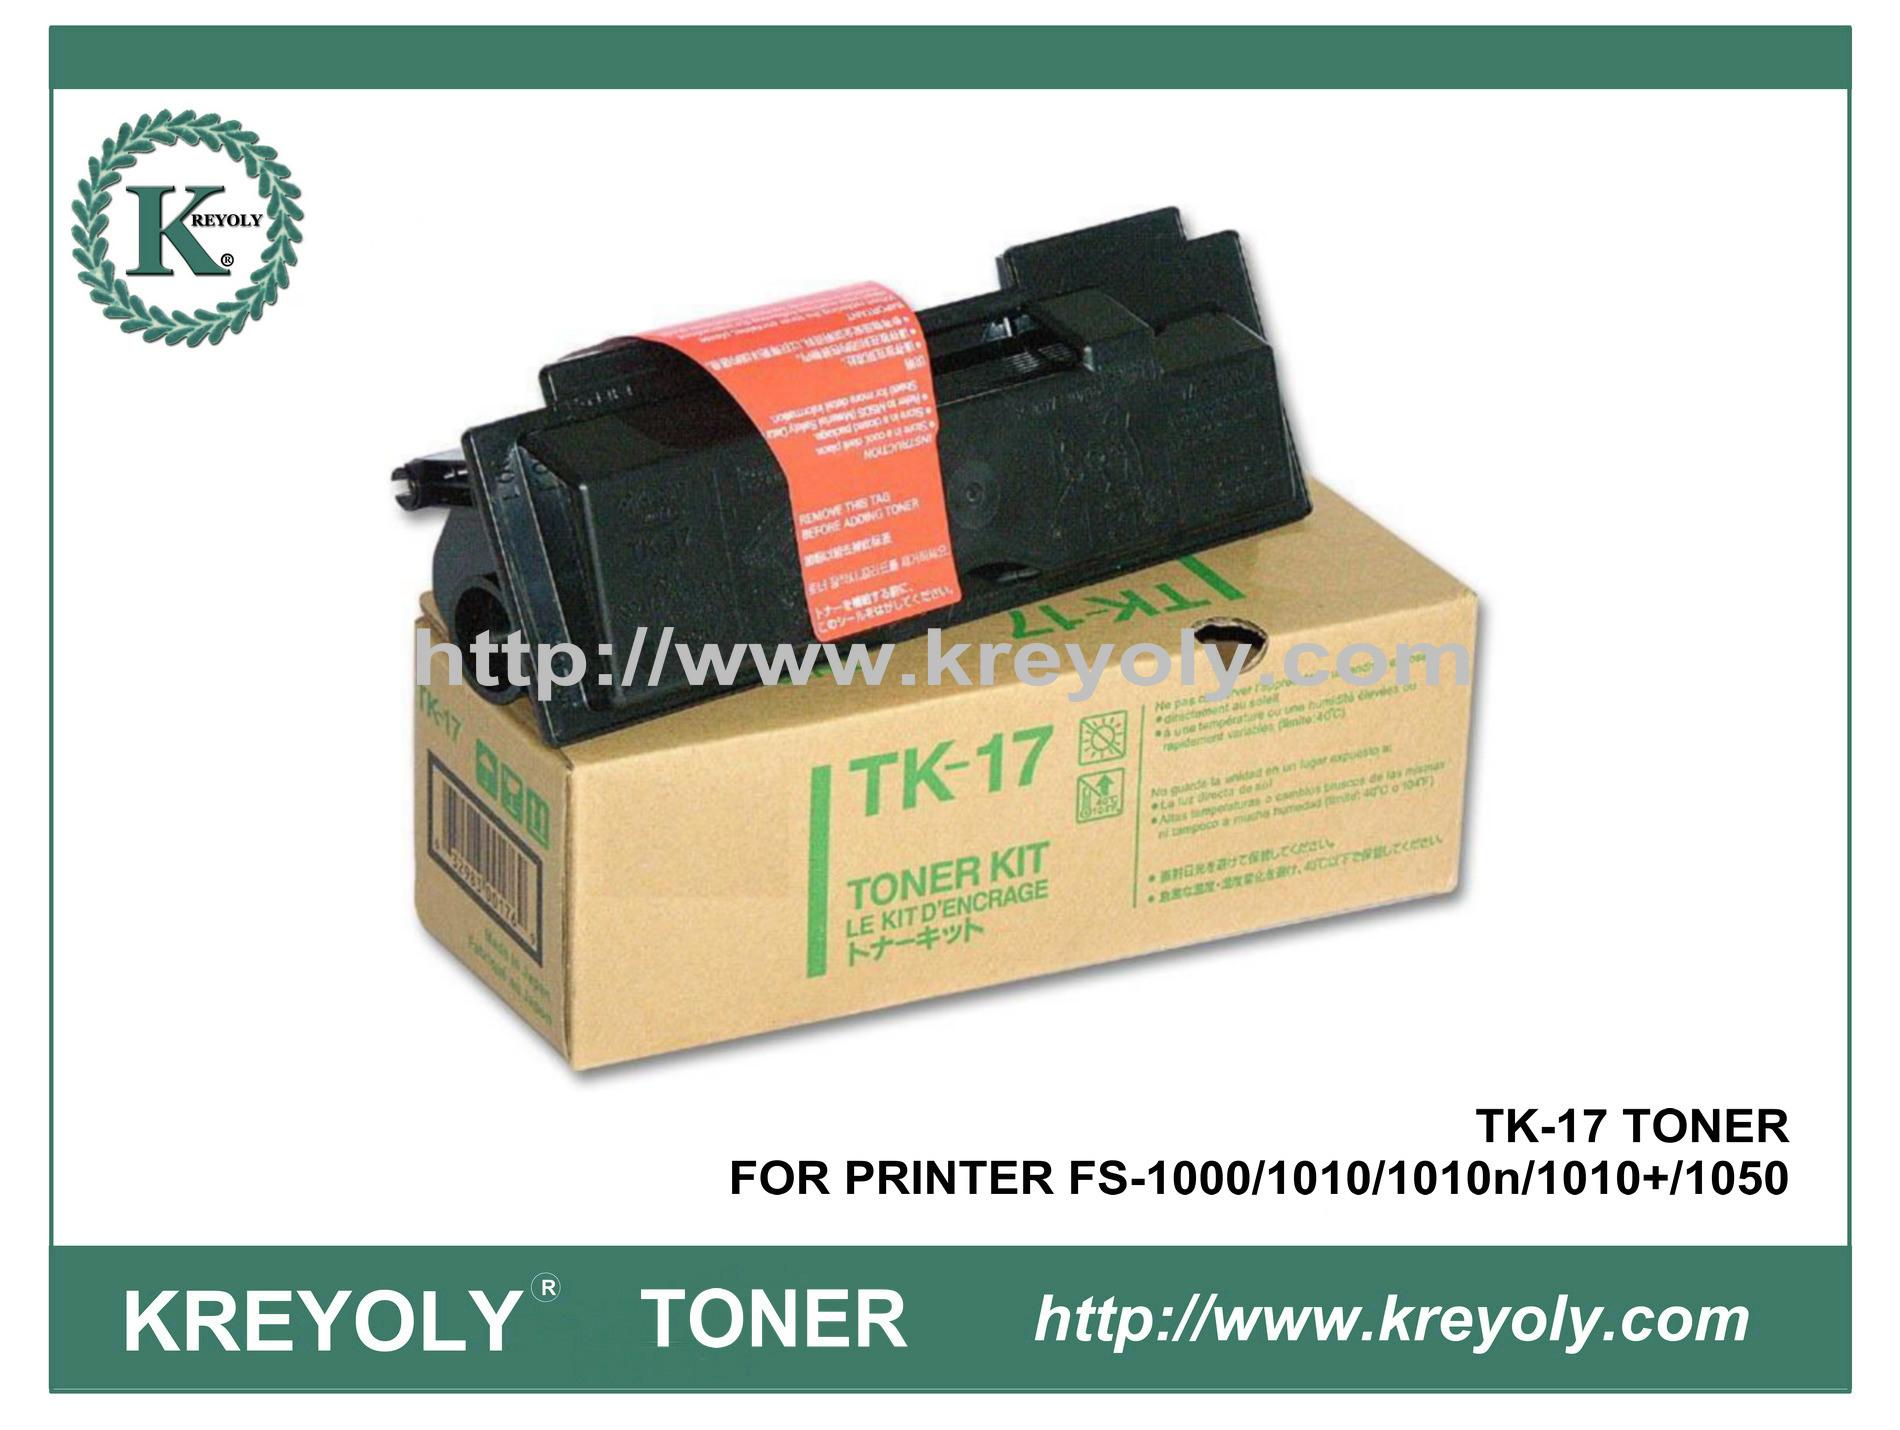 1000 1010 china tk-17 toner for printer fs-1000/1010/1010n/1010+/ 1050